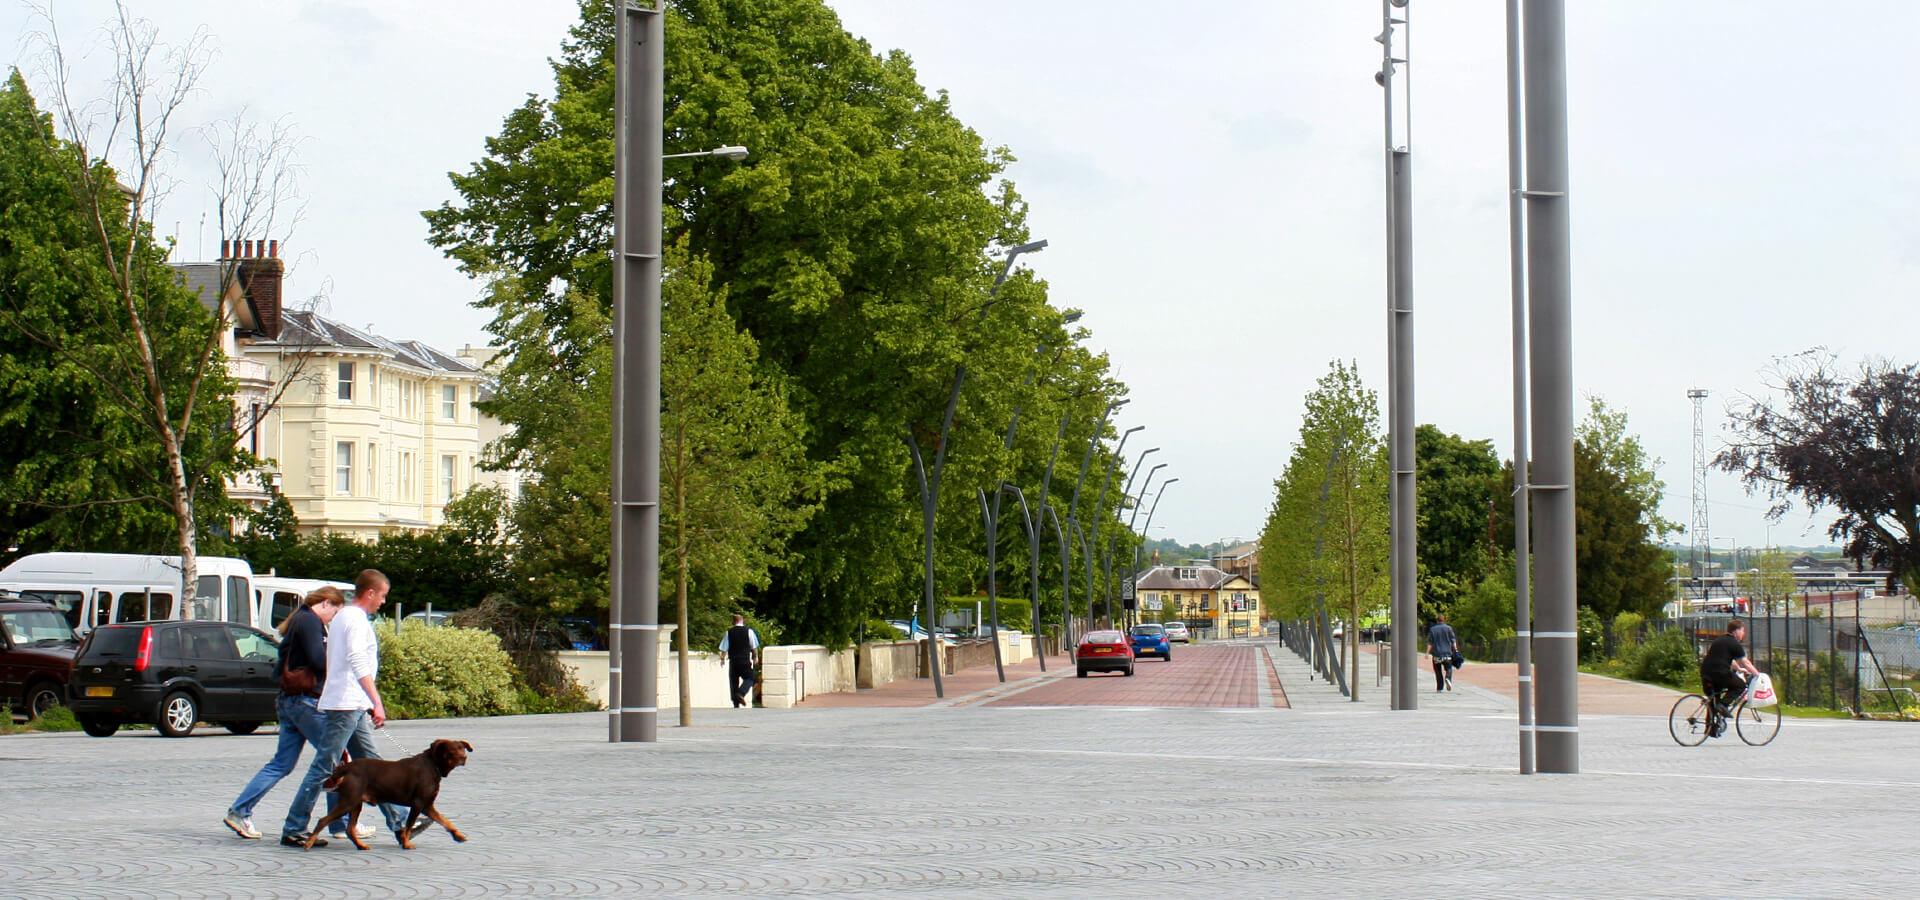 Ashford Ring Road